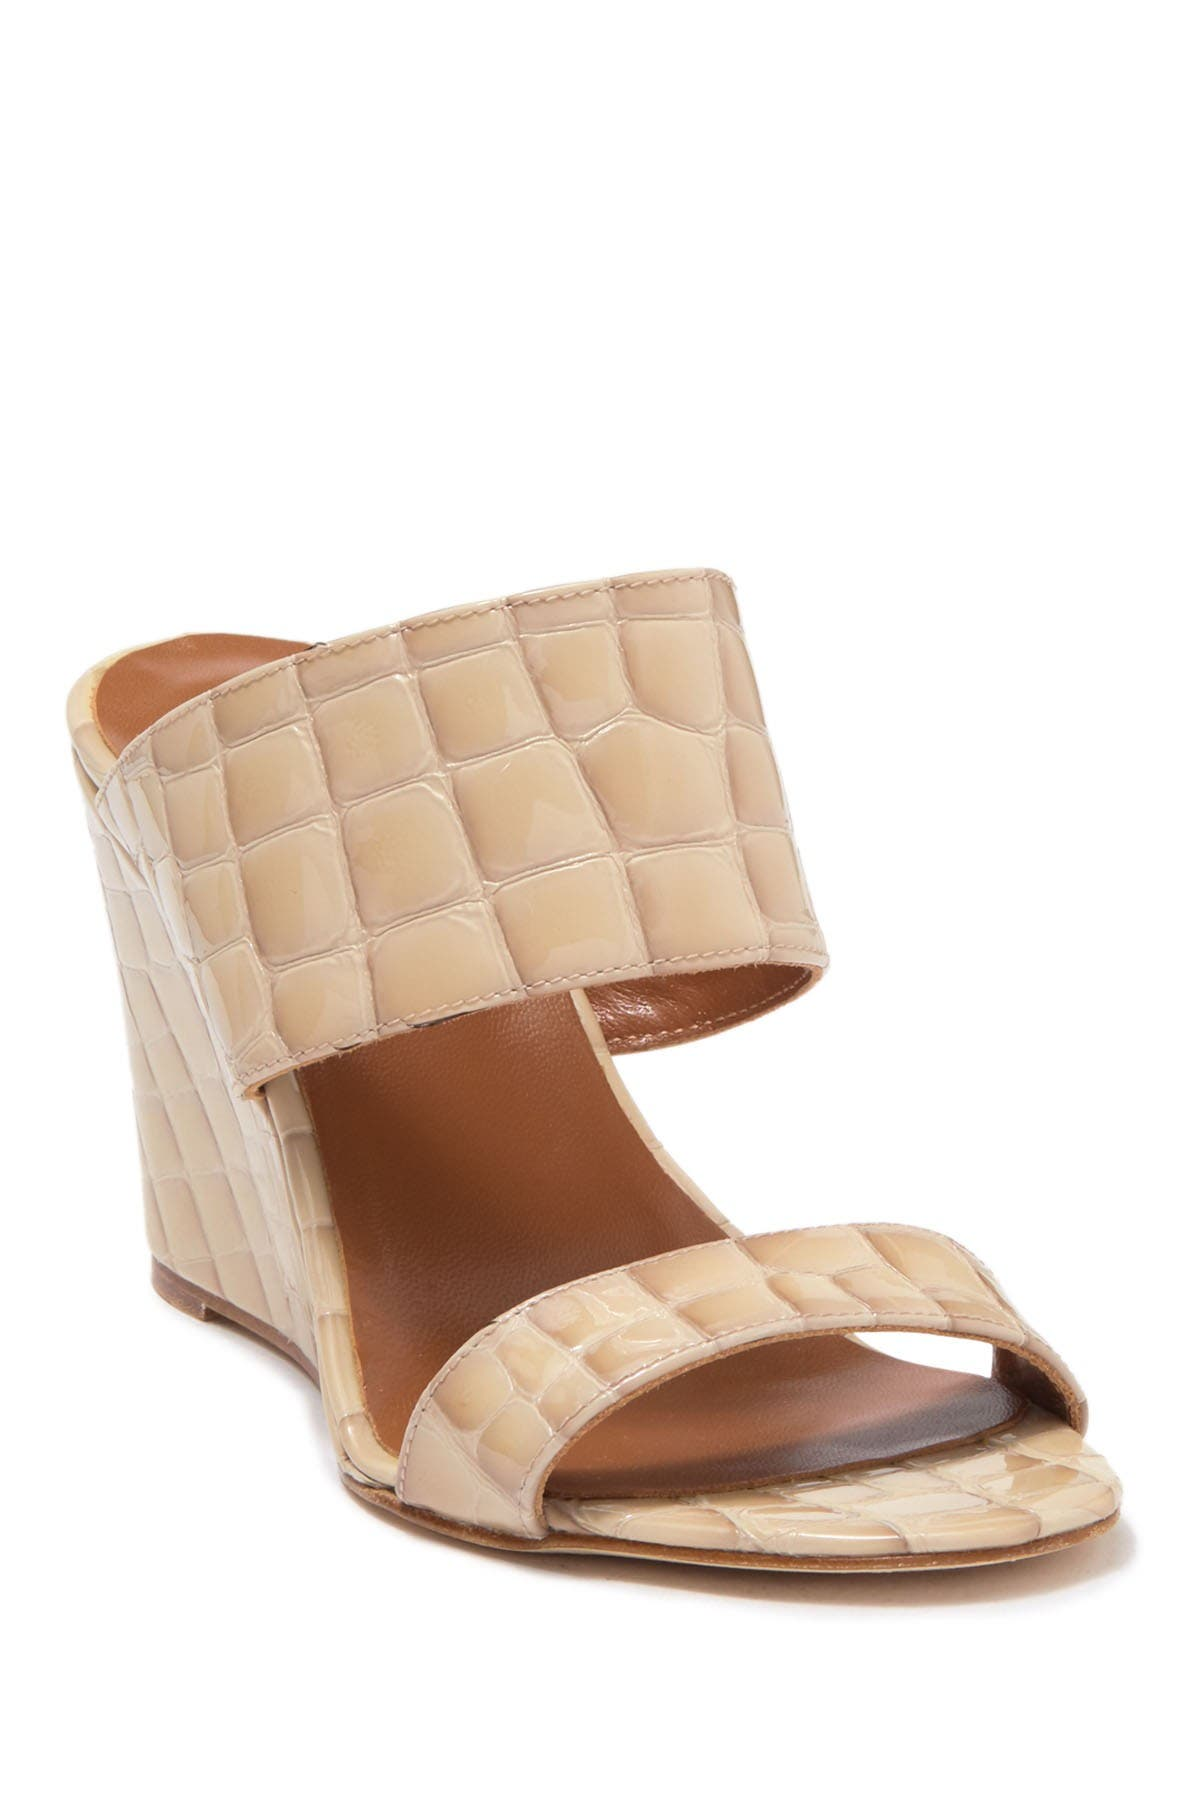 Image of PARIS TEXAS Patent Croc Embossed Wedge Sandal